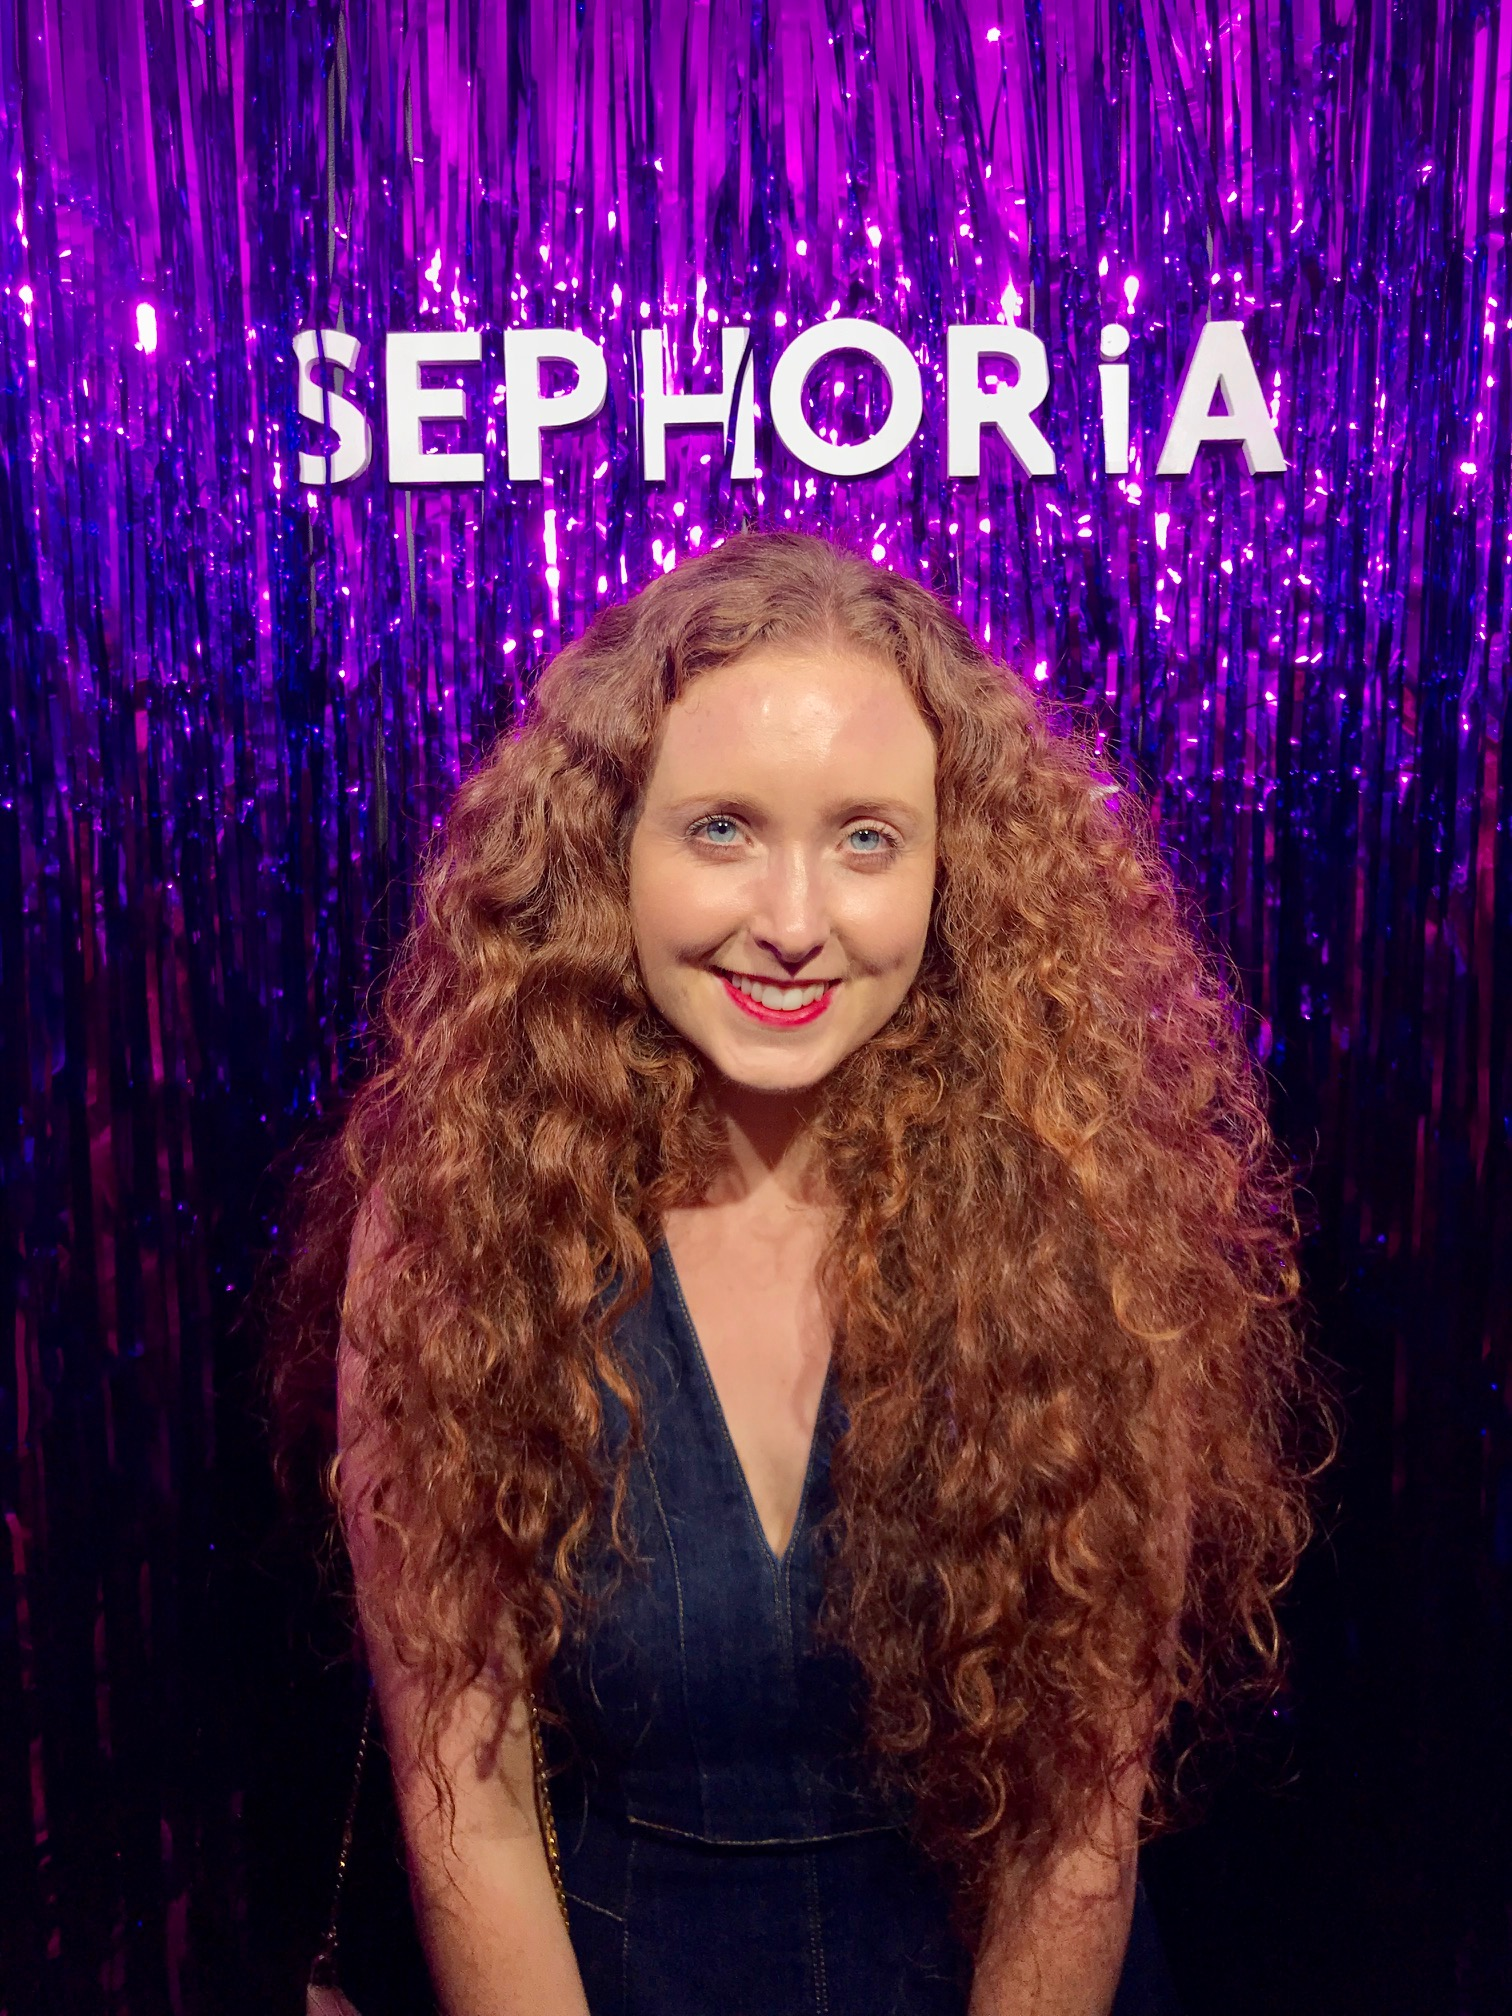 Sephoria - the most amazing beauty event!